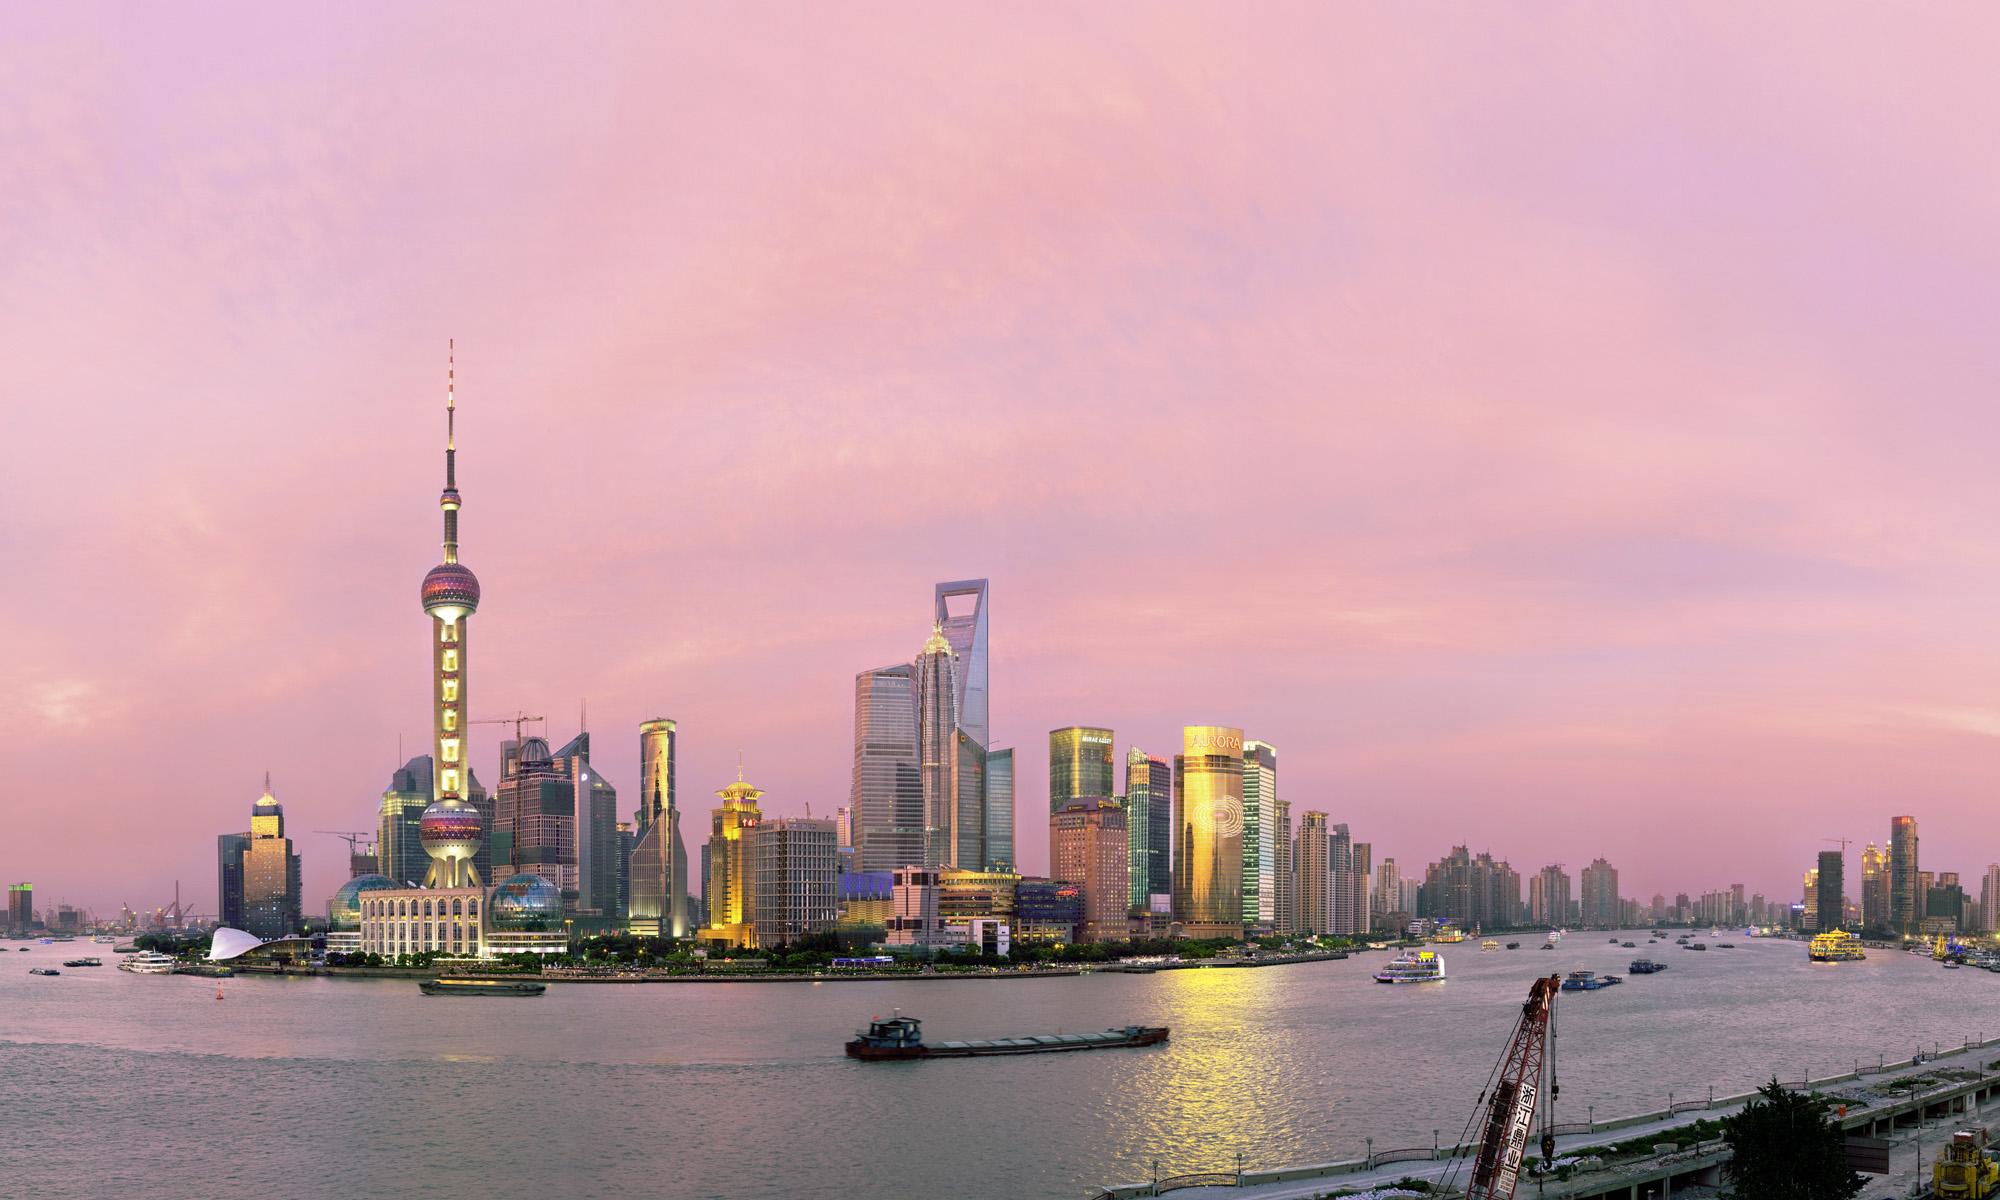 Pudong Rose - Shanghai 2009